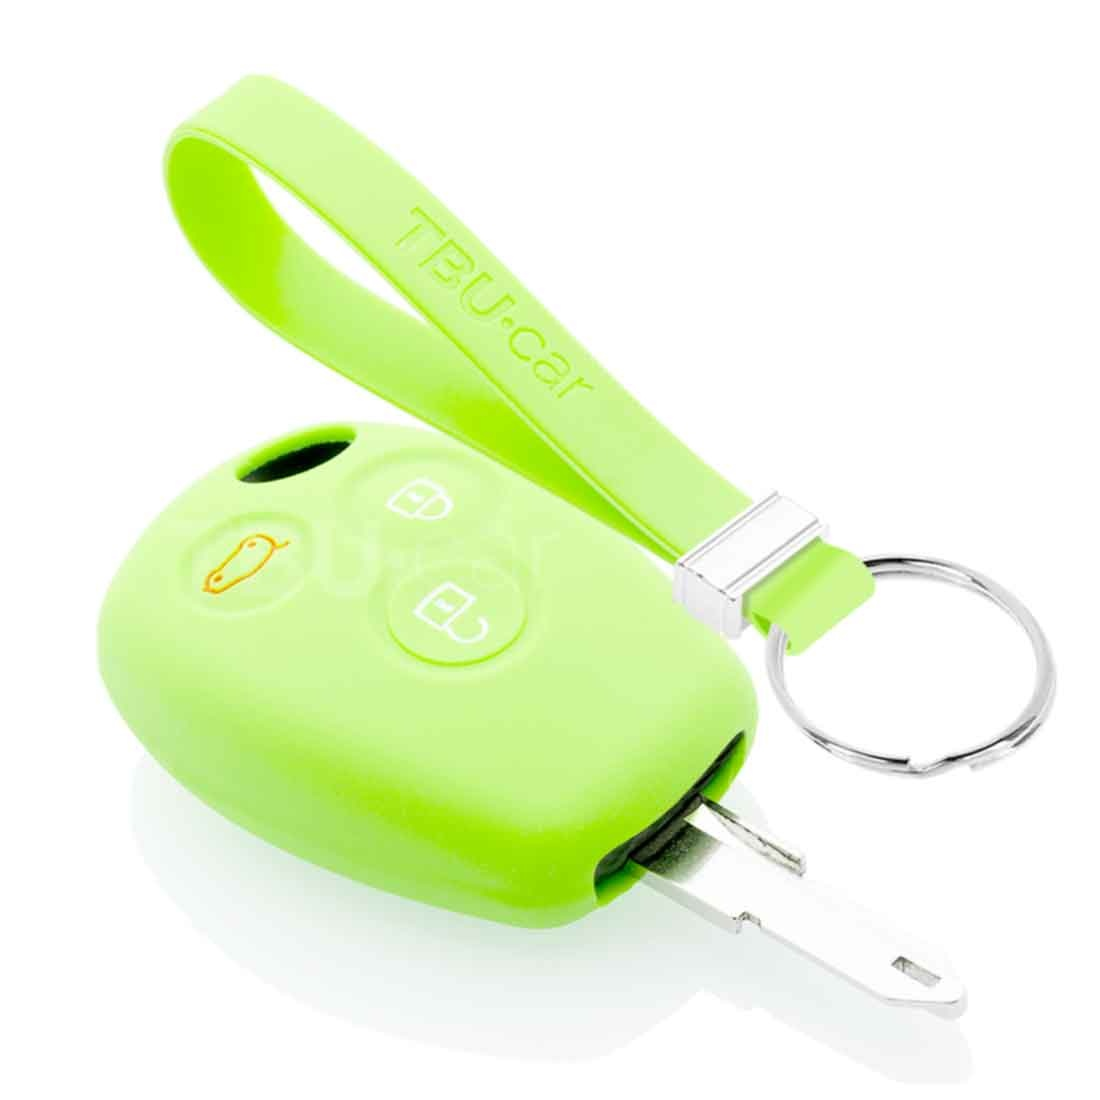 TBU car TBU car Autoschlüssel Hülle kompatibel mit Dacia 3 Tasten - Schutzhülle aus Silikon - Auto Schlüsselhülle Cover in Im Dunkeln leuchten